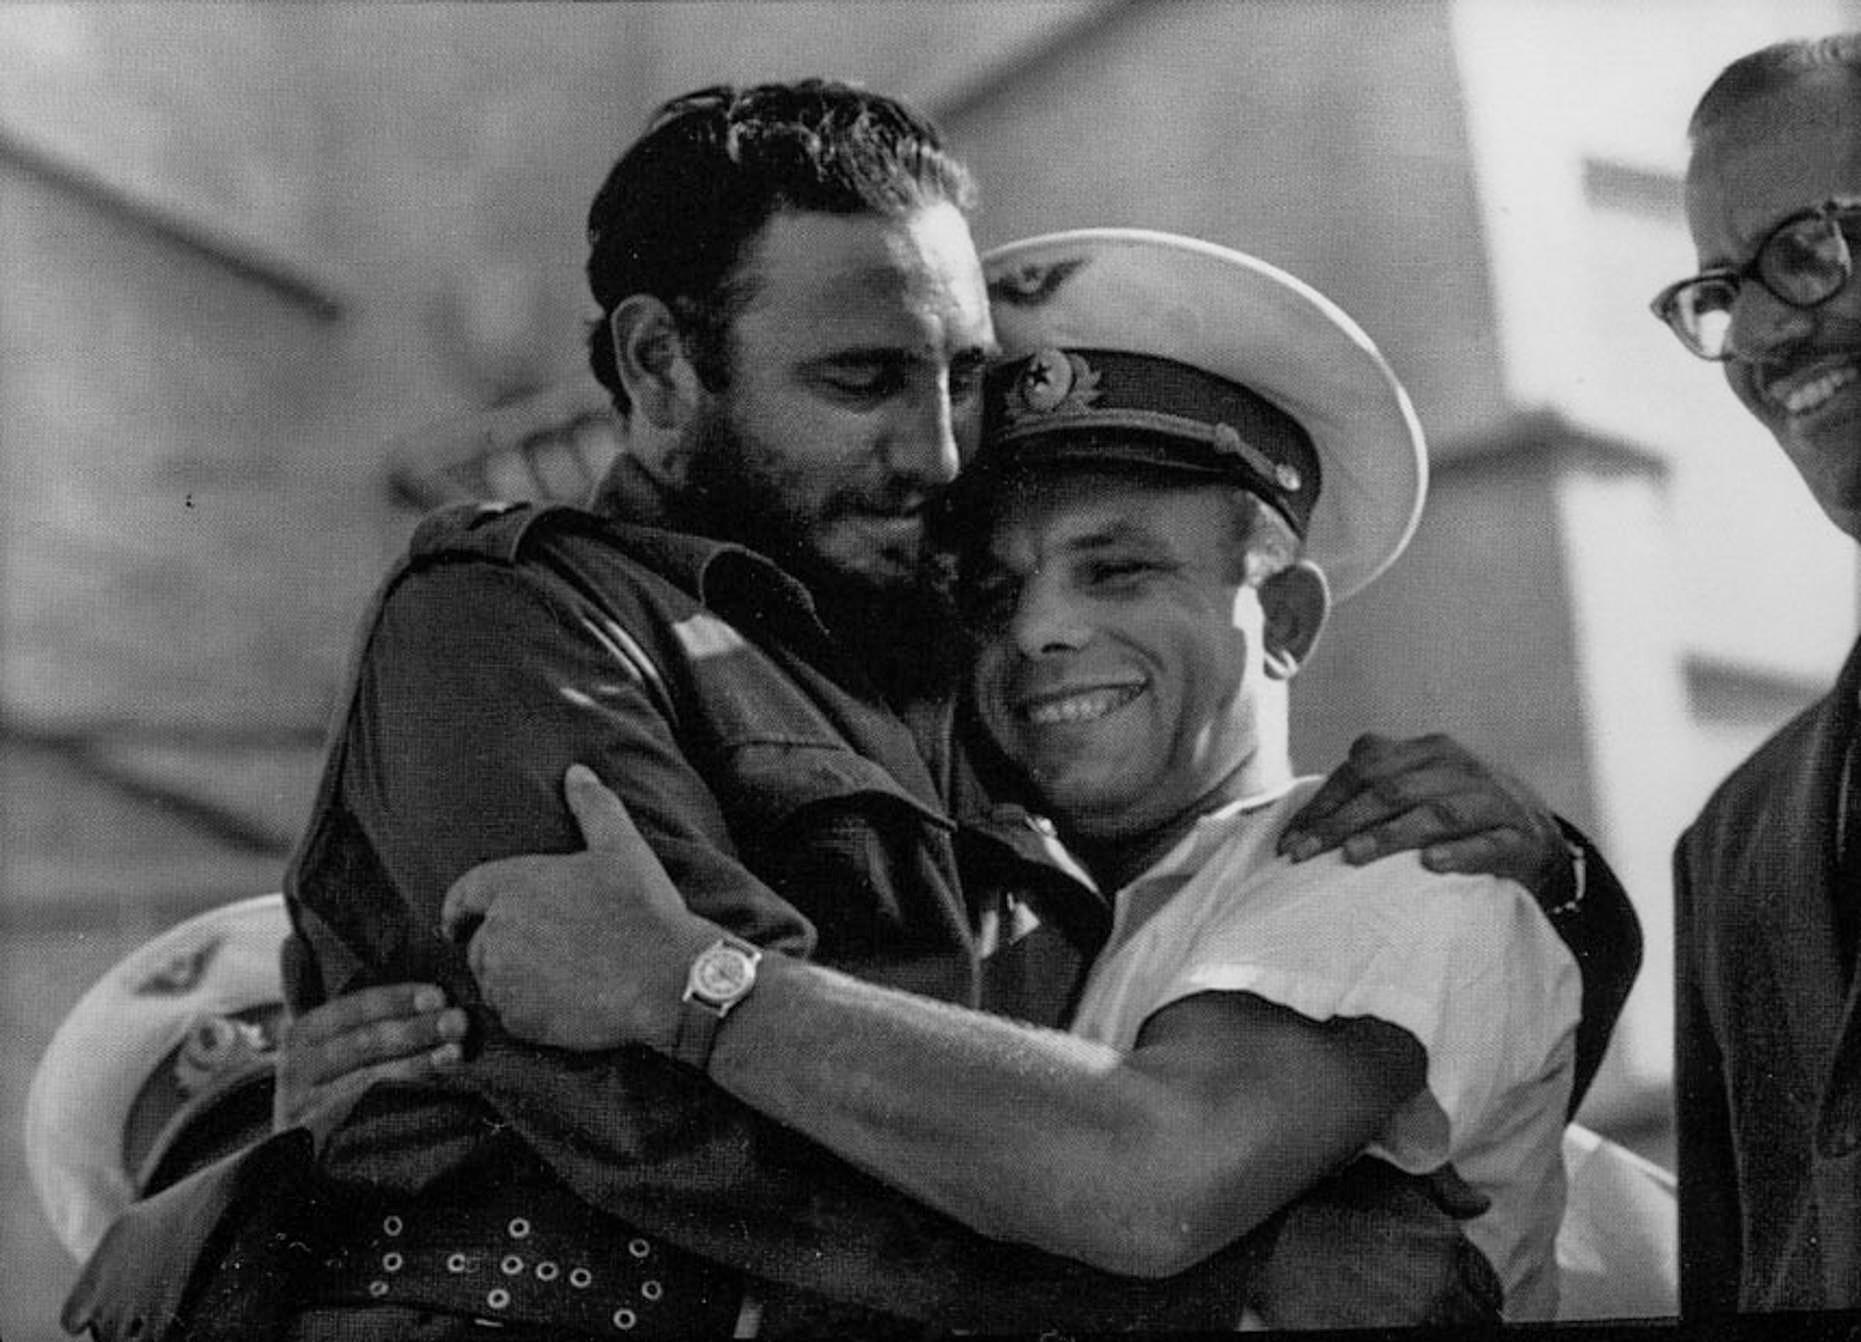 Topli susret Fidela Castra i Jurija Gagarina, 26. lipnja 1961.